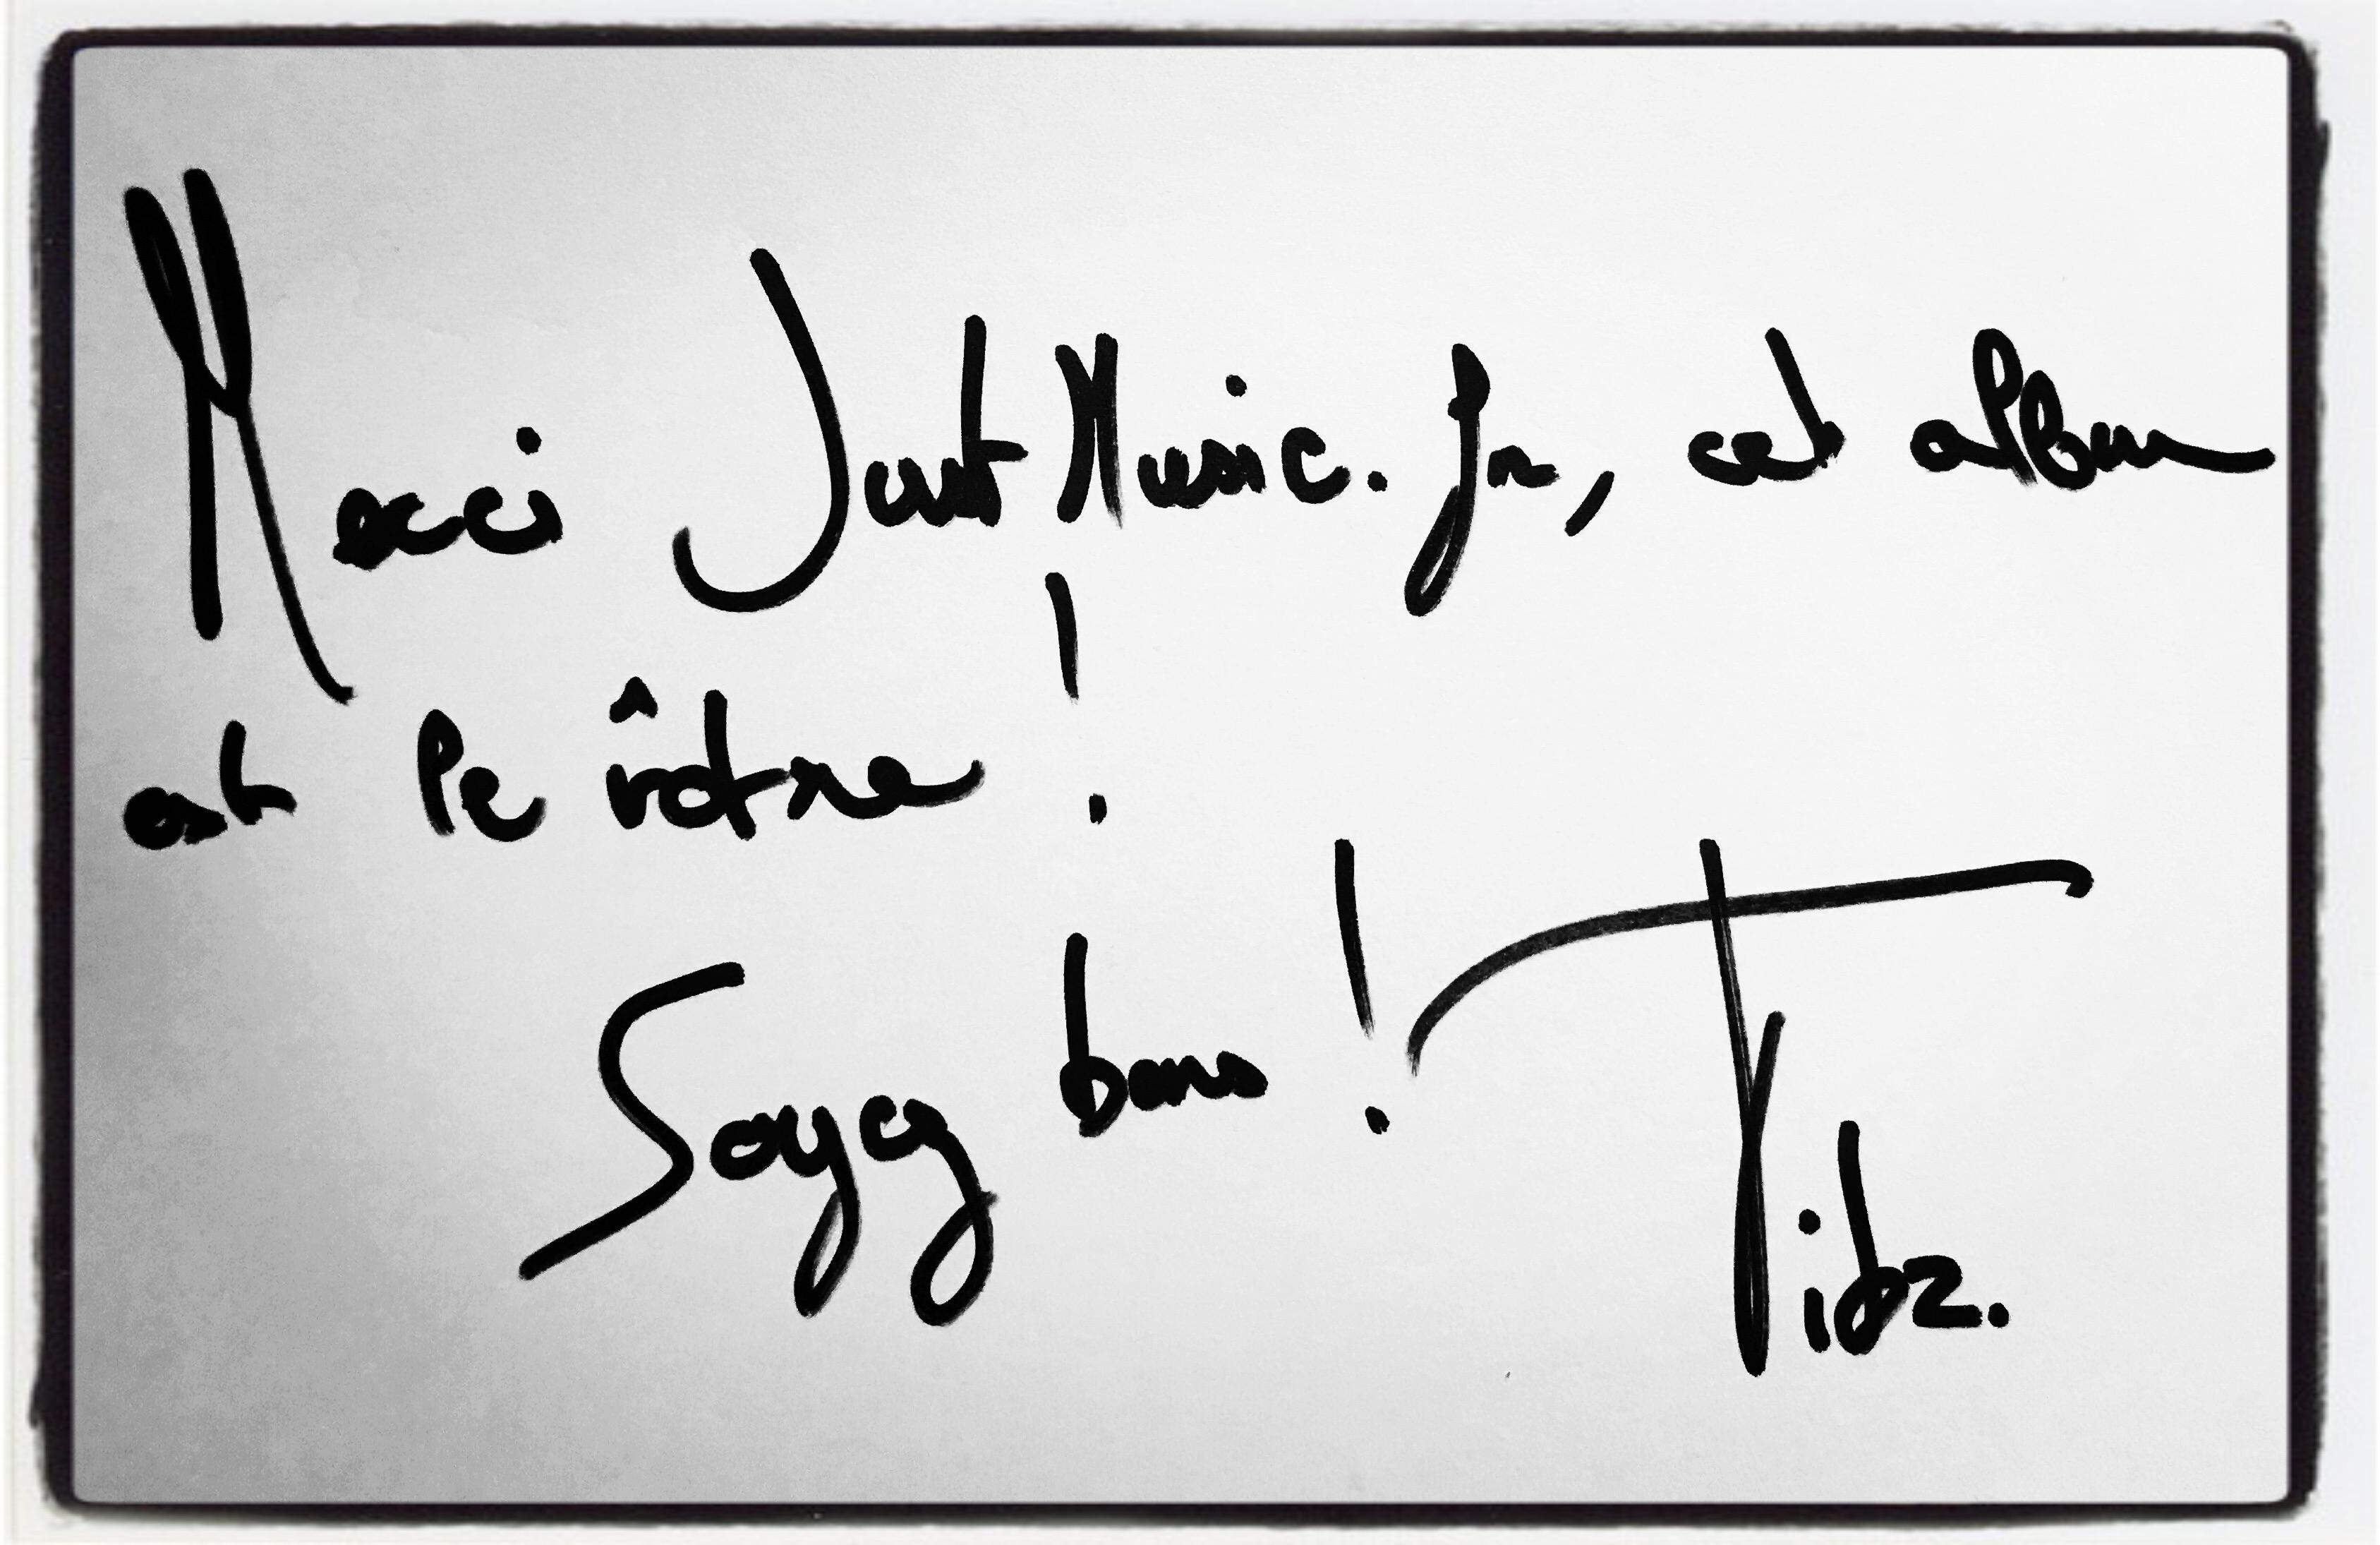 Tibz Dédicace JustMusic.fr